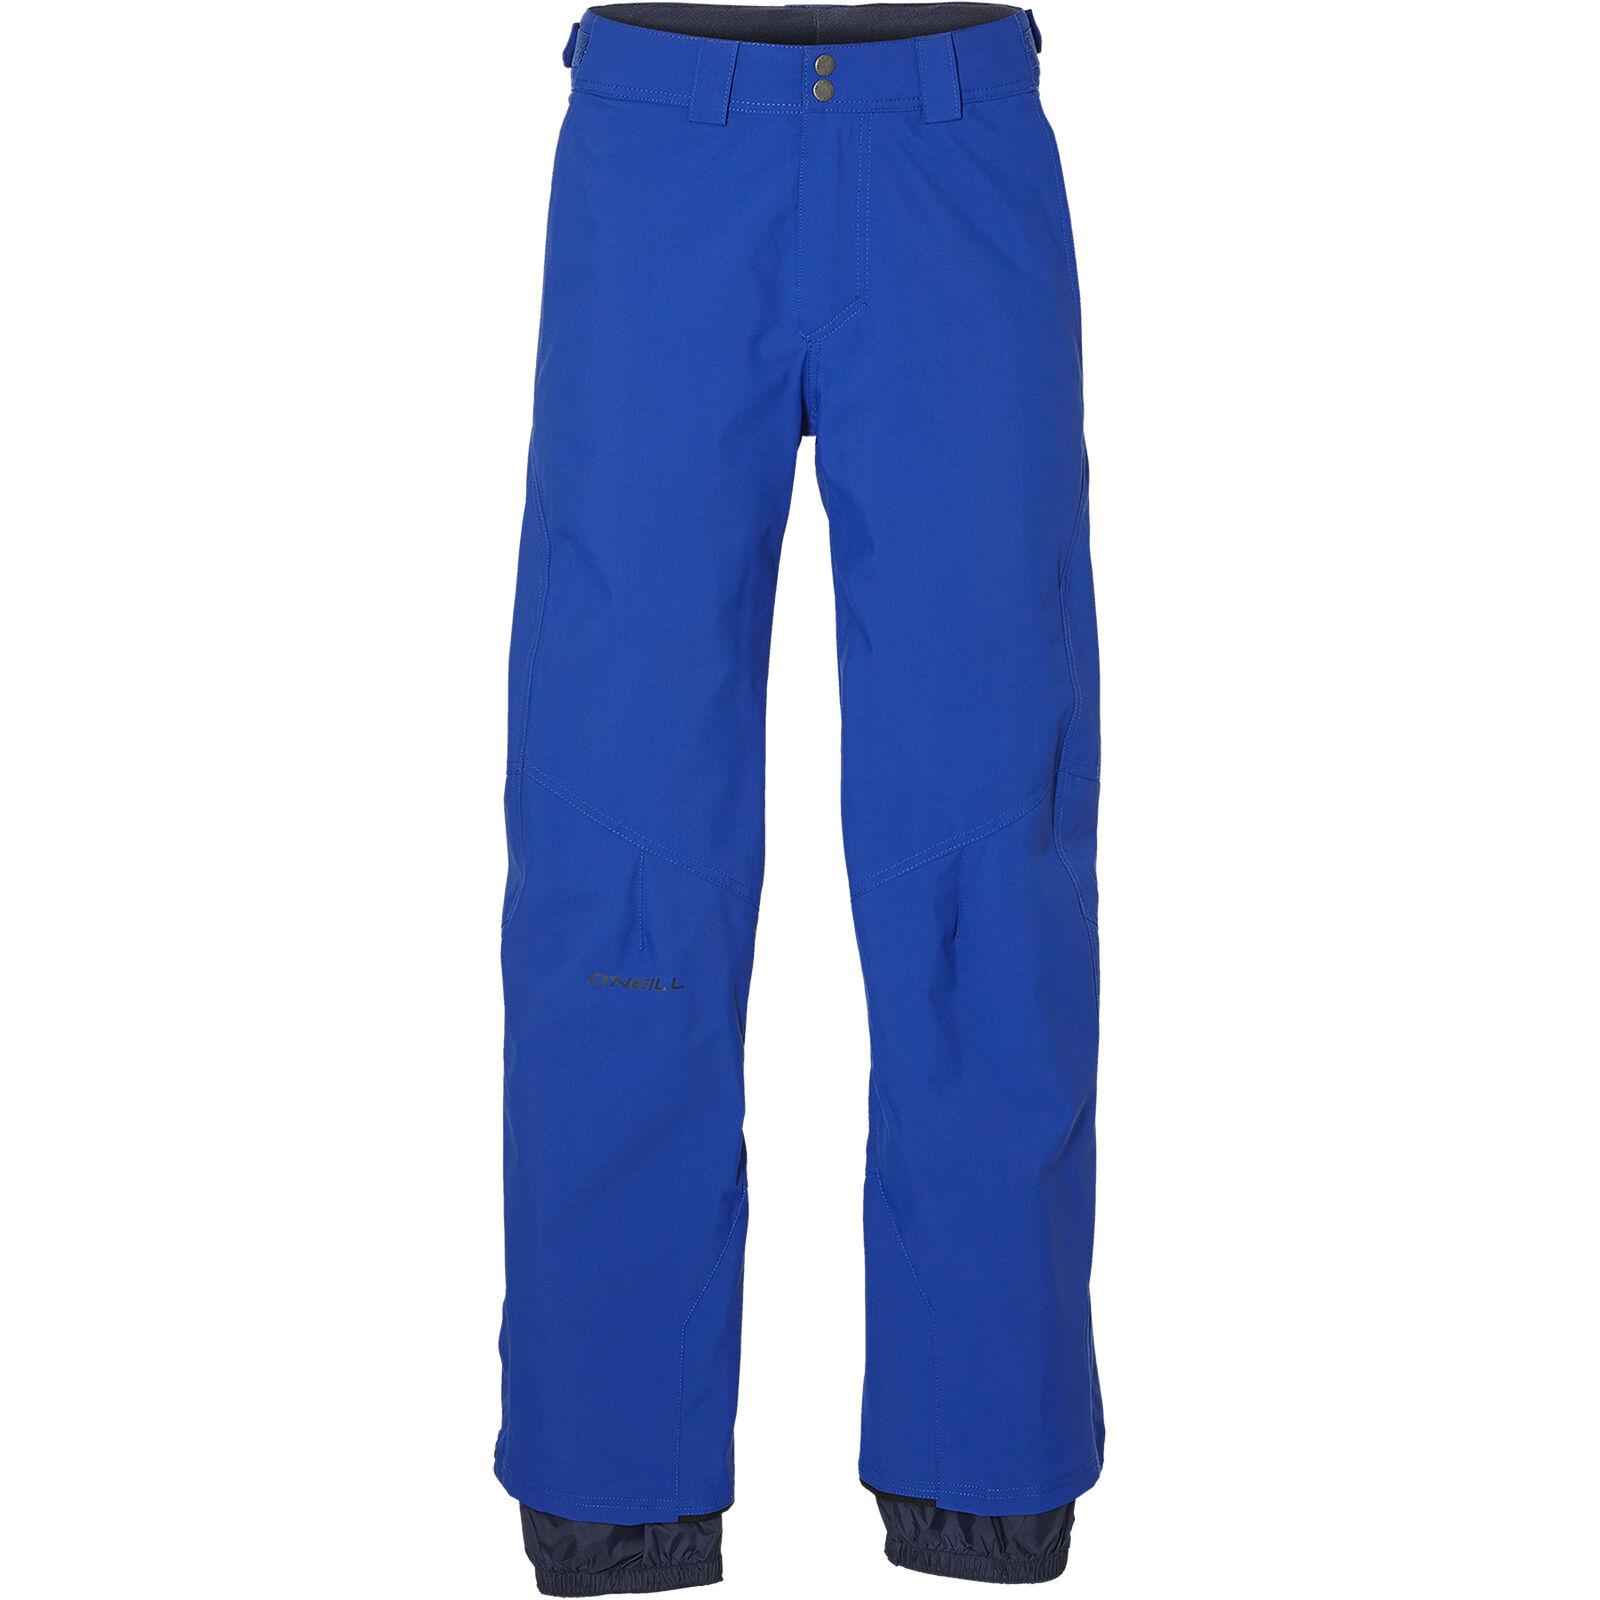 O'Neill Pantalones Esquí Snowboard Pm Martillo Pantalones blue Impermeable